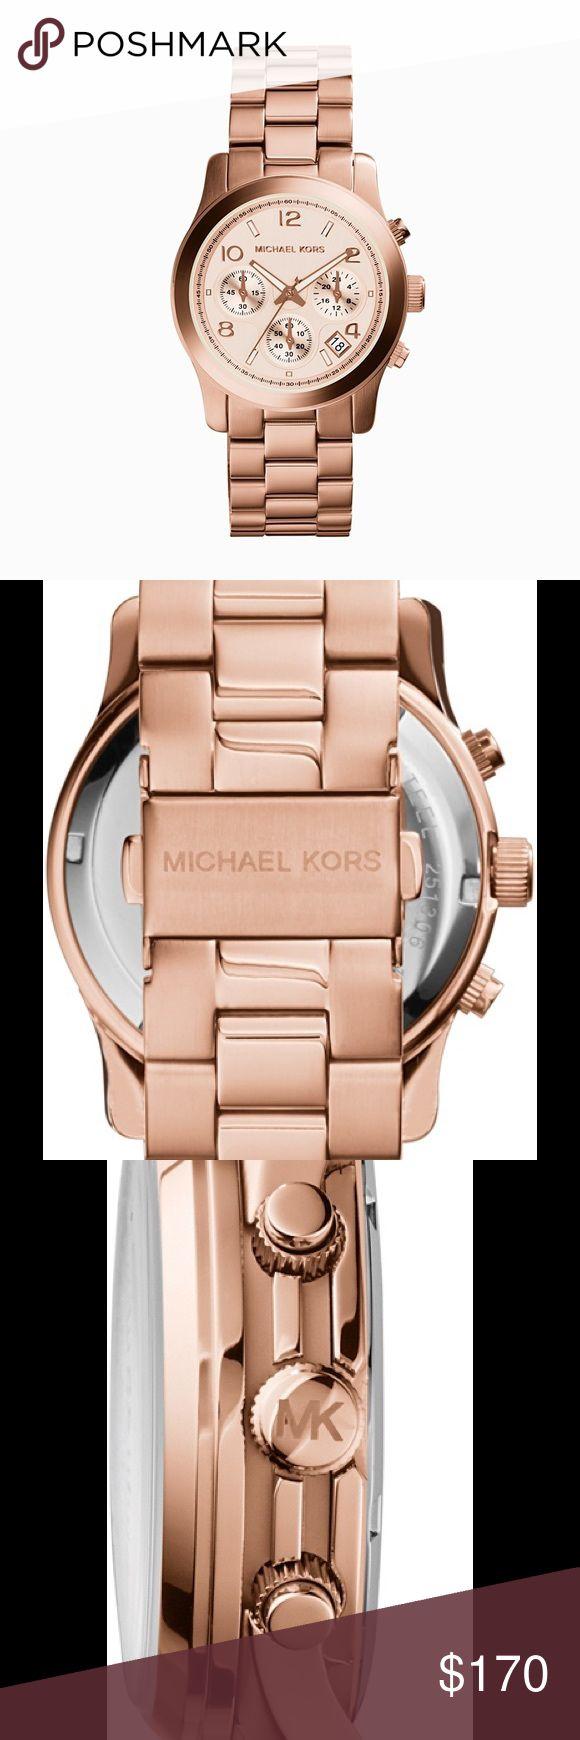 MICHAEL KORS rose gold watch MICHAEL KORS rose gold watch . The Mk-5128 KORS Michael Kors Accessories Watches